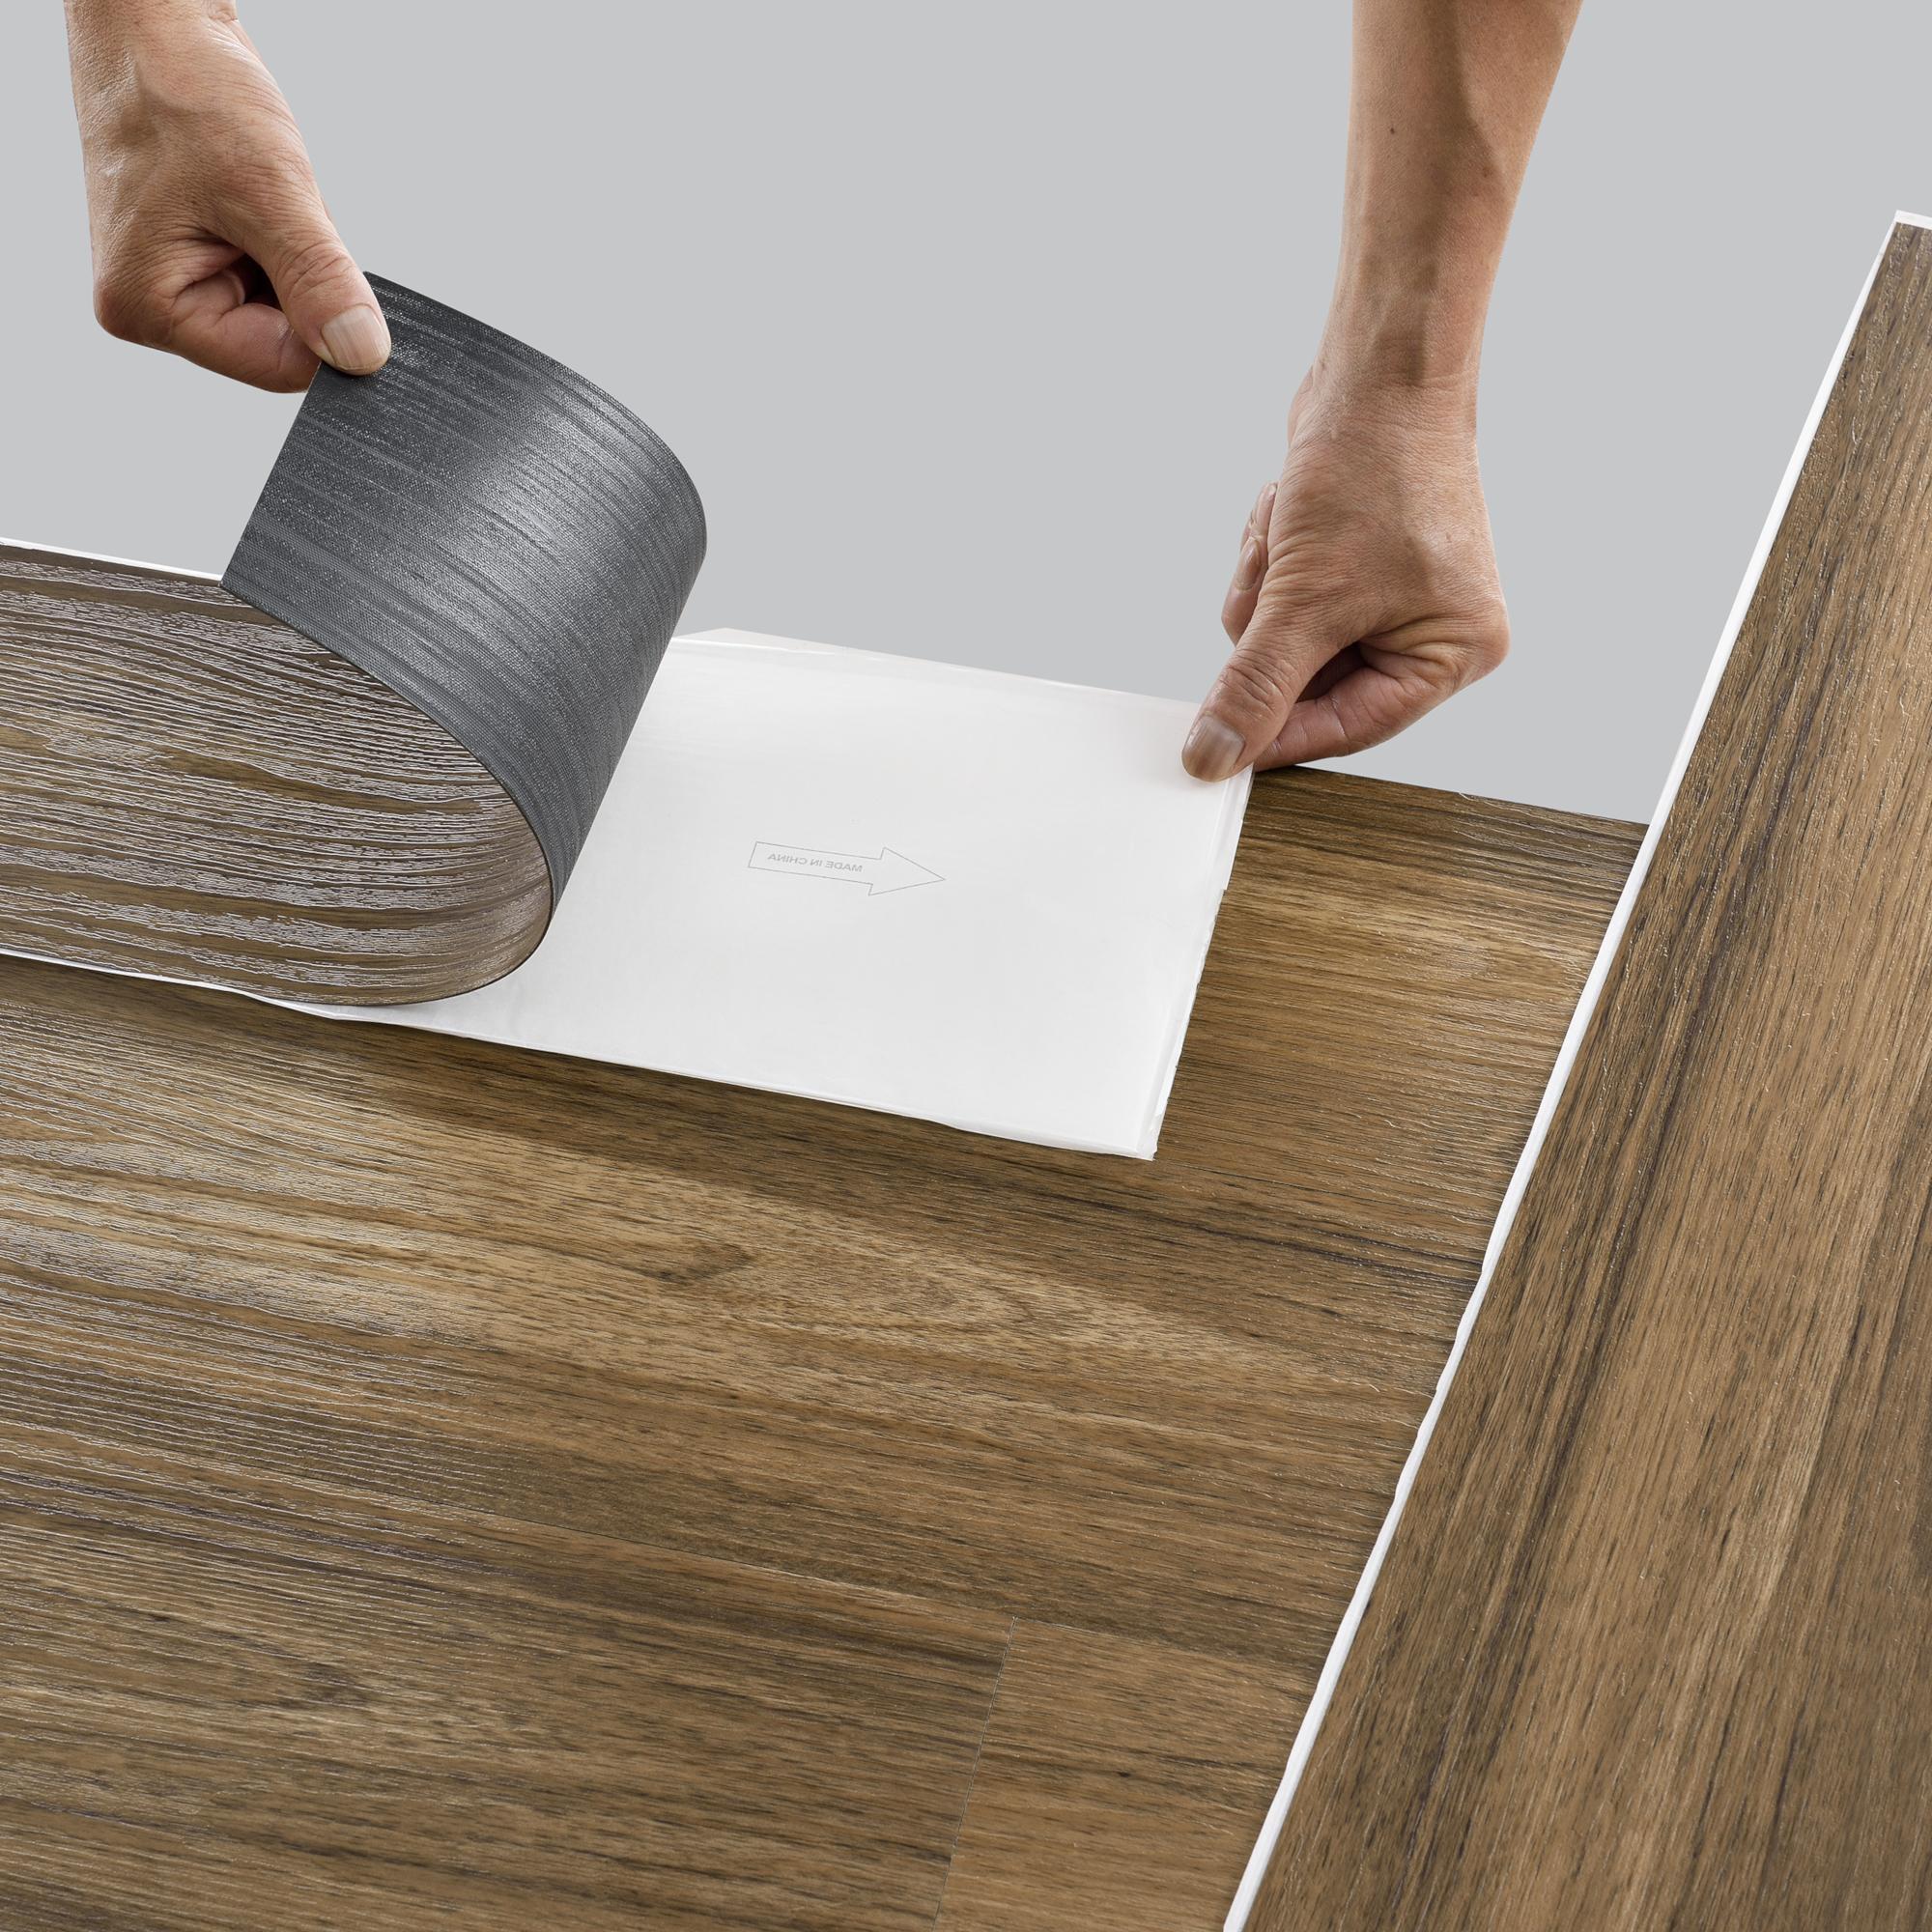 PVC Laminat Dielen Vinyl Bodenbelag ca 1m² 0,3mm Nutzschicht Landhausdiele